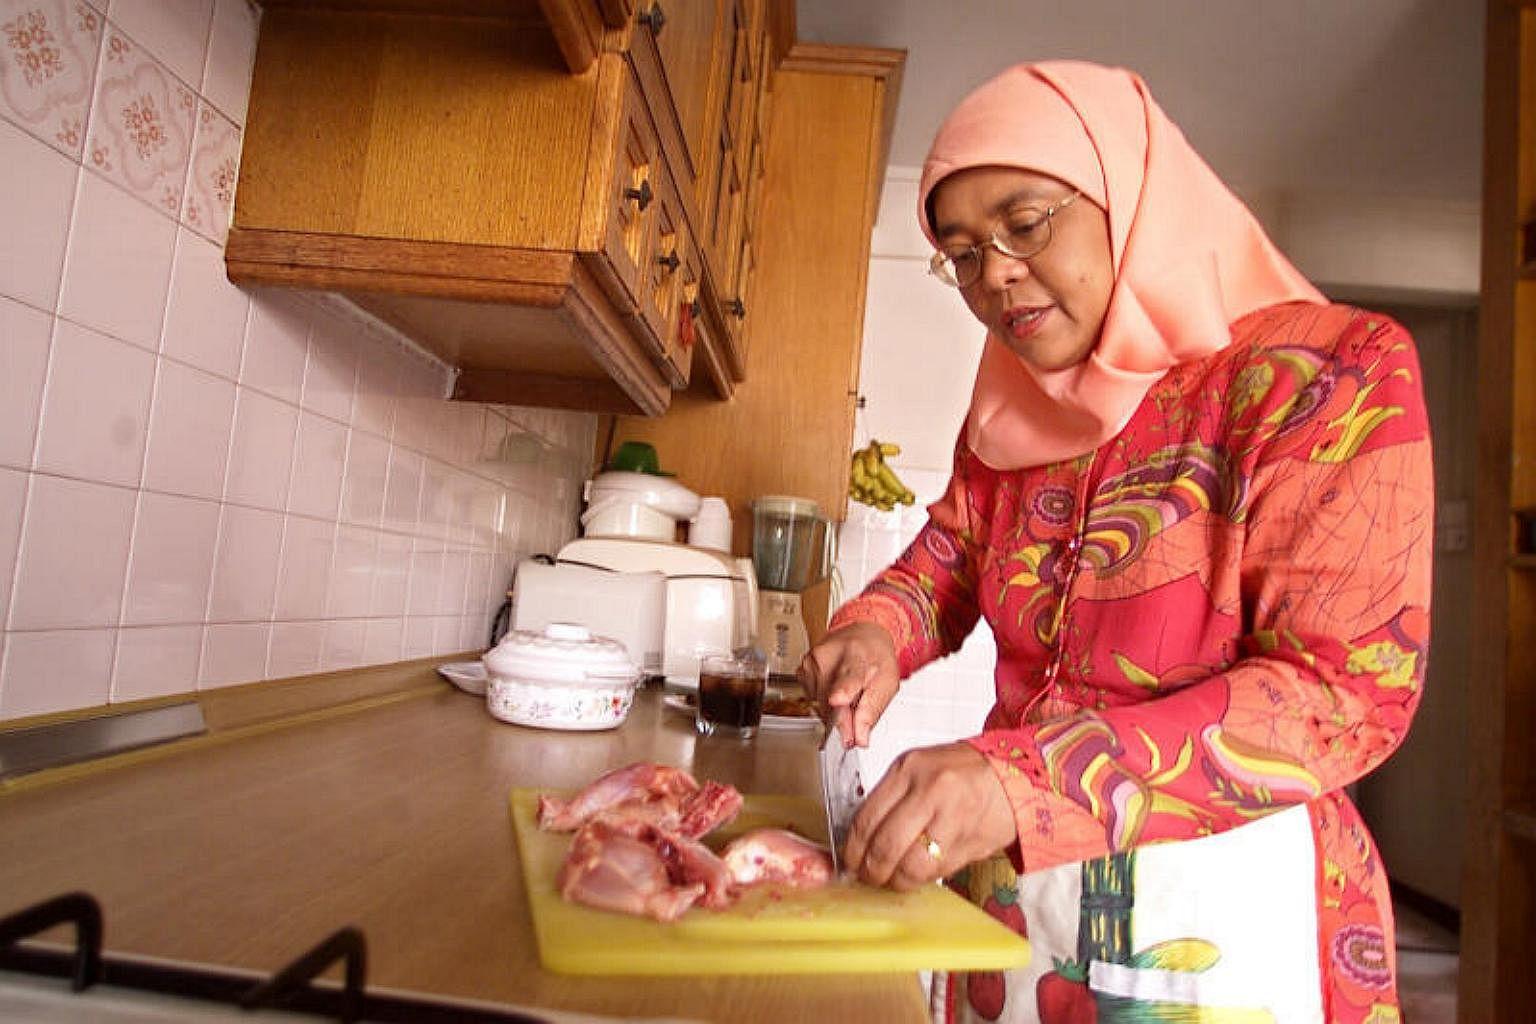 Картинки по запросу halimah yacob family photo